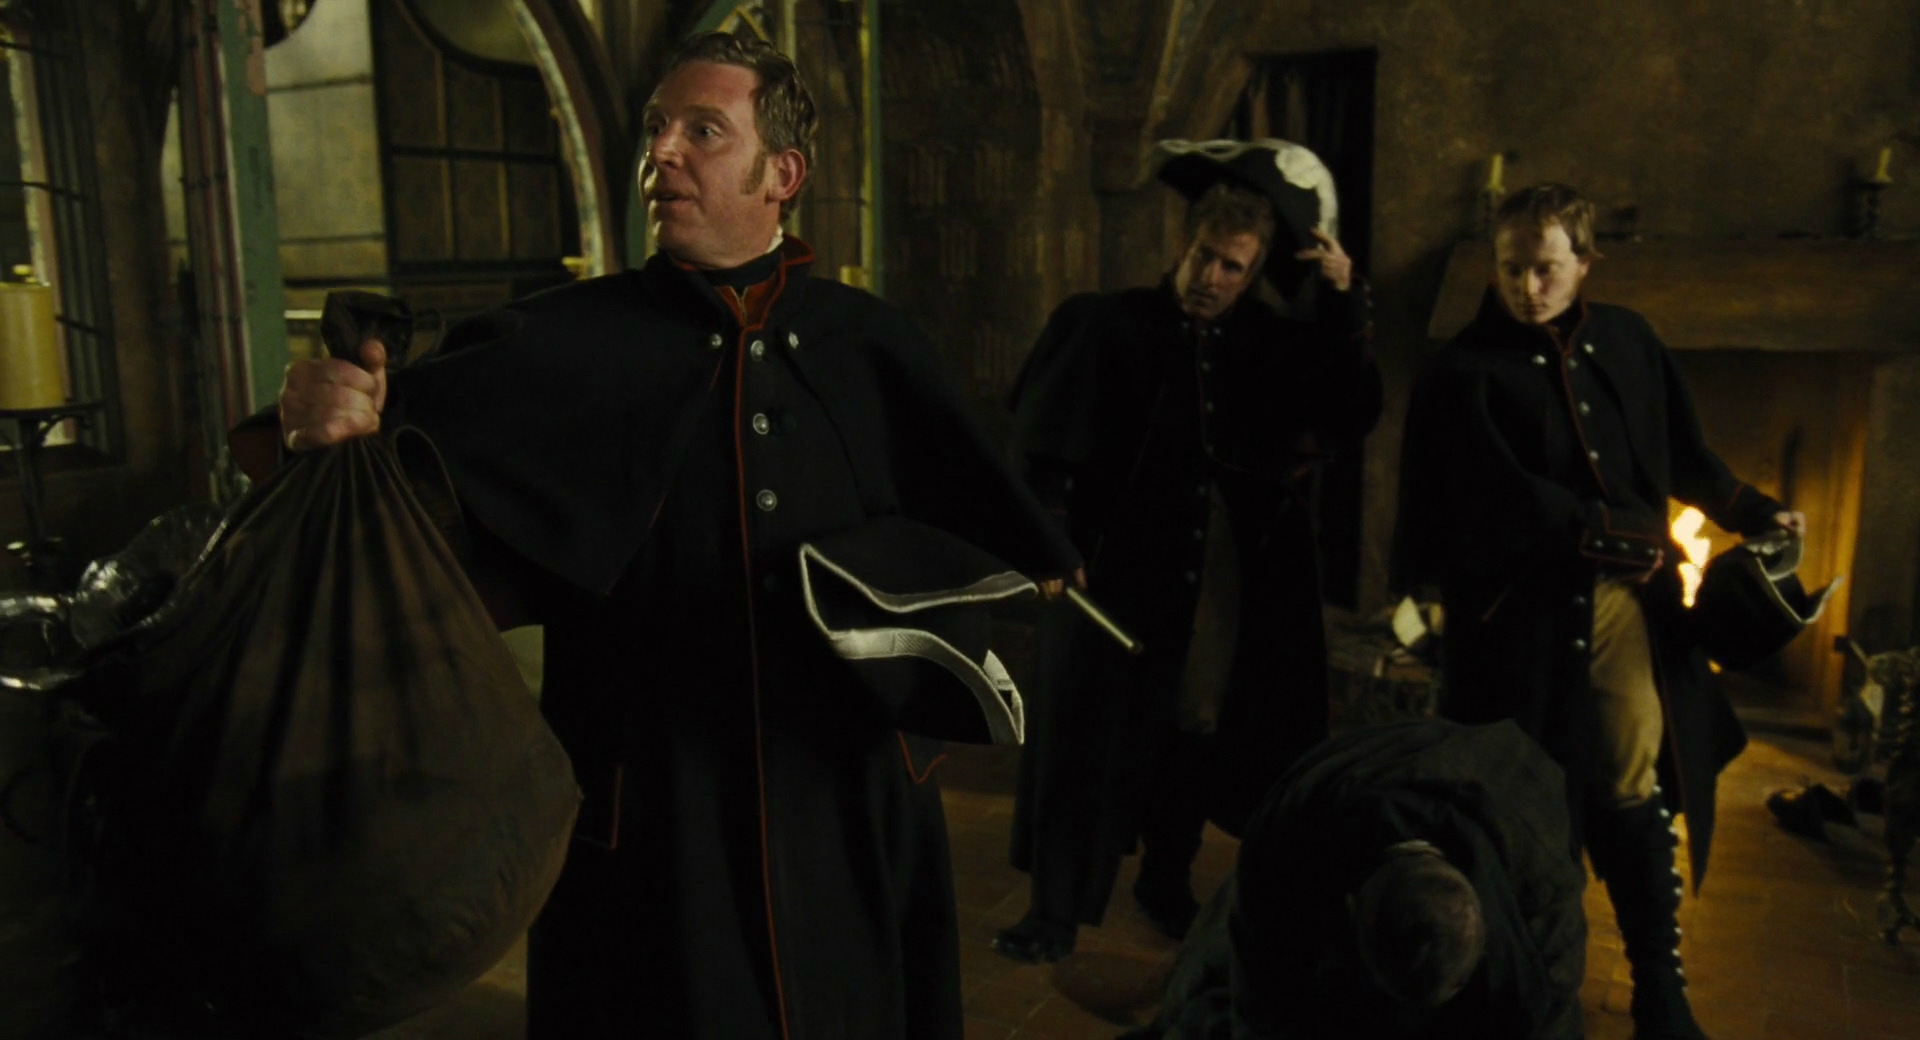 prologue valjean arrested valjean forgiven les